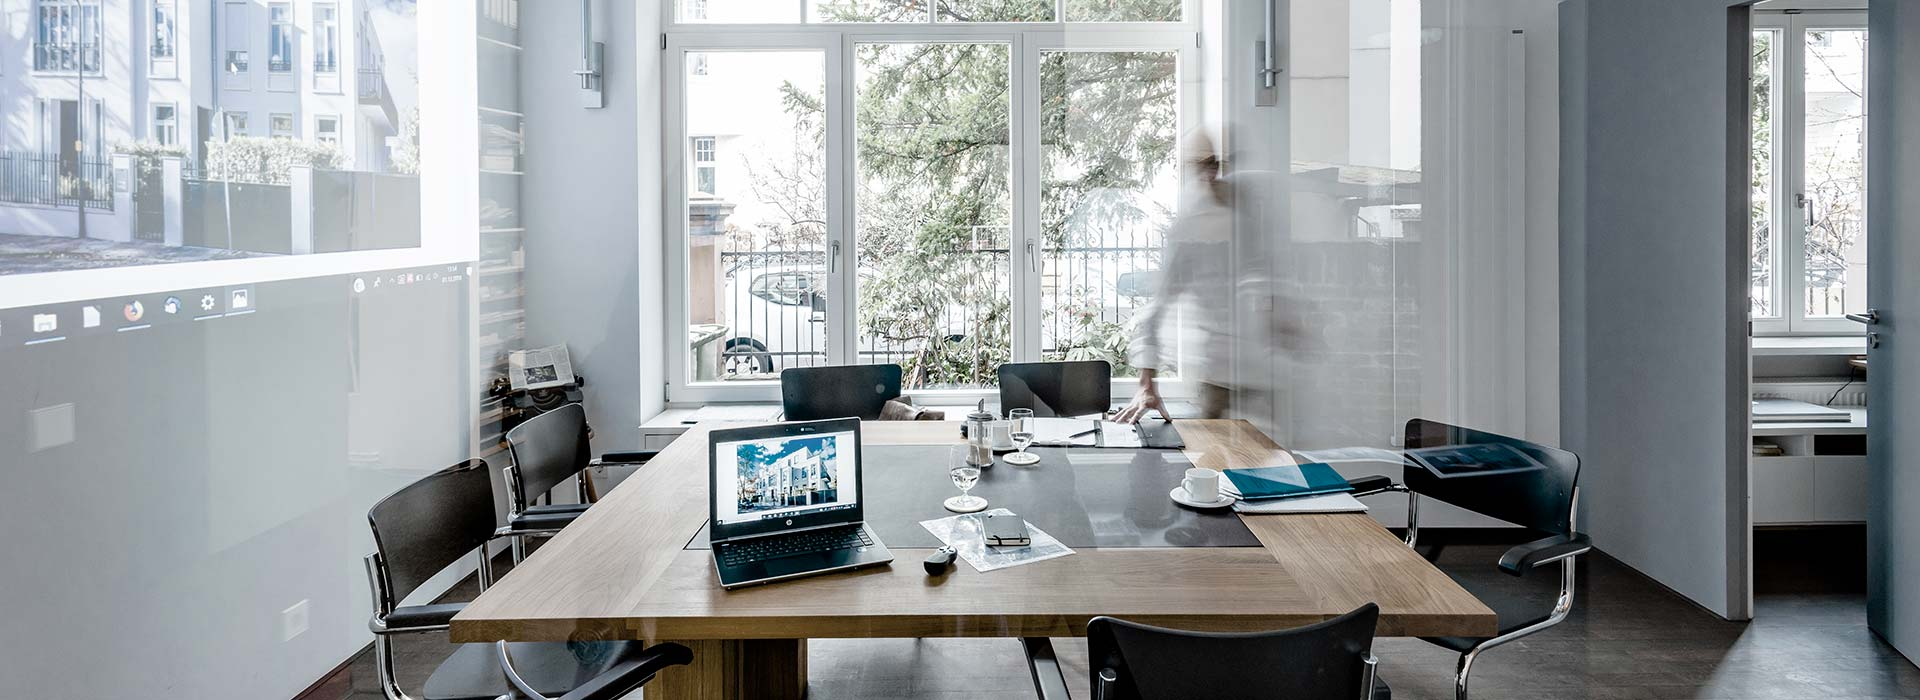 Gerstner Kaluza Architektur Frankfurt – Büro